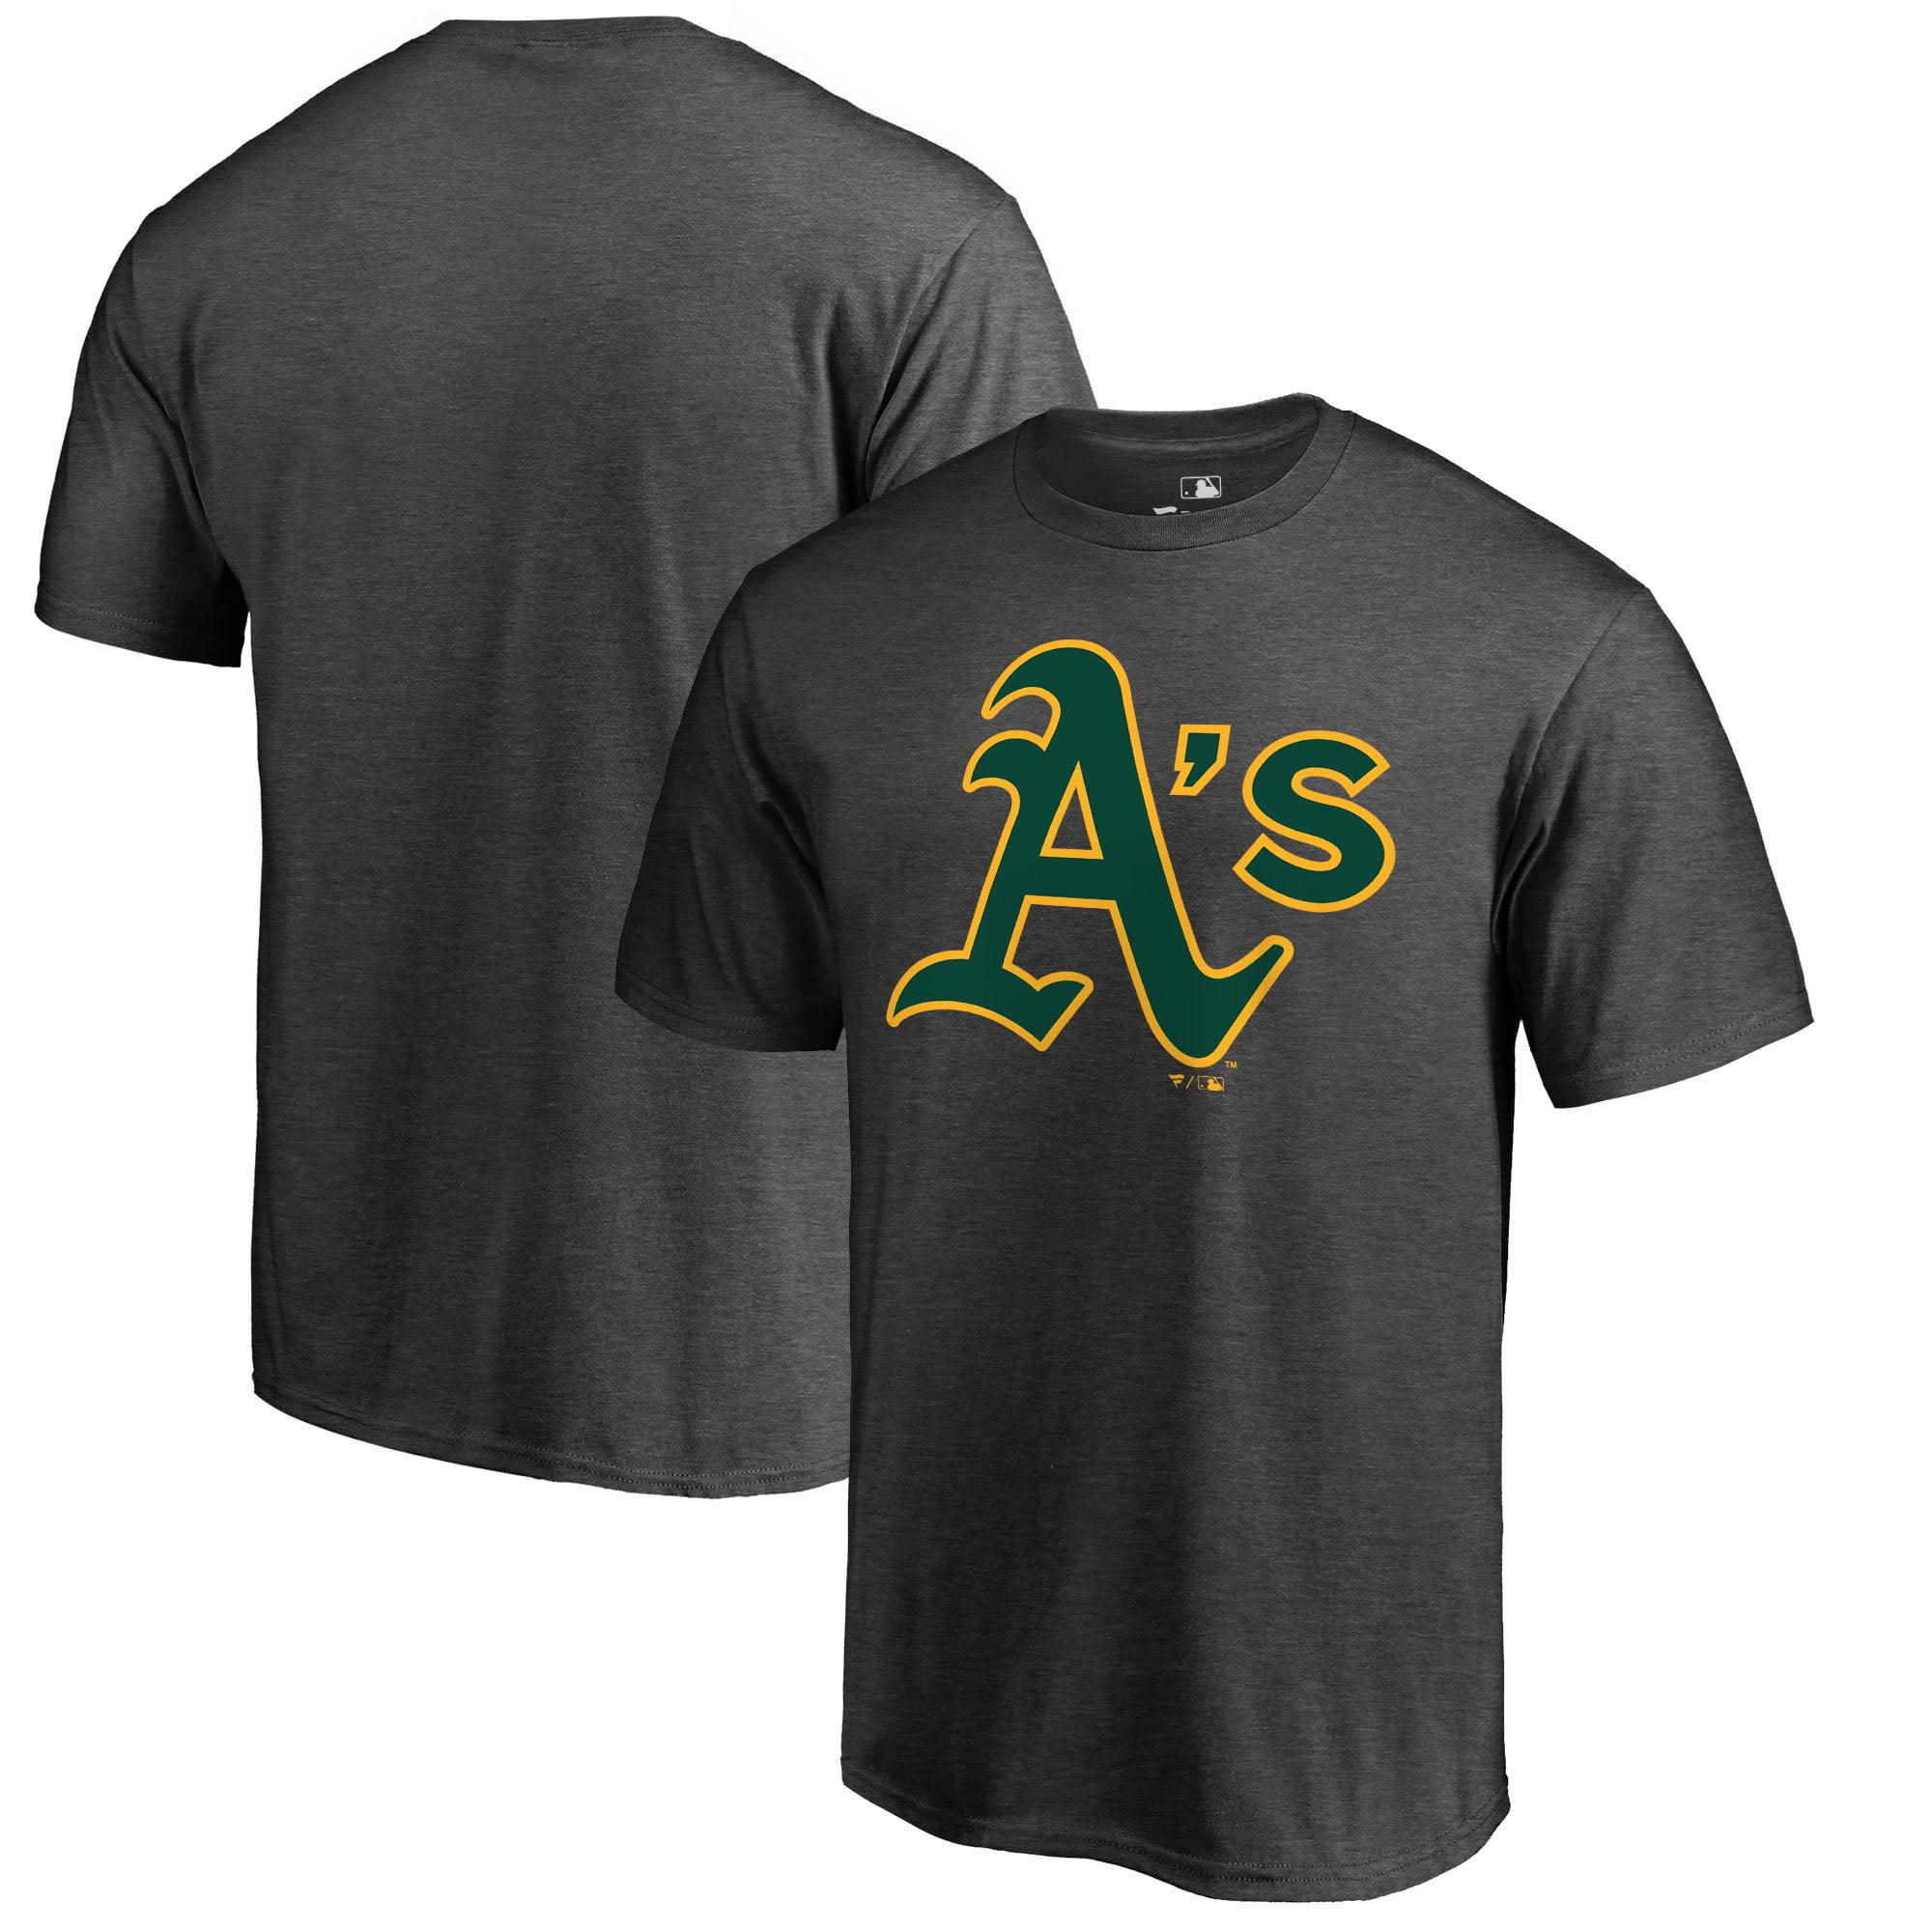 Oakland Athletics Fanatics Branded Primary Logo T-Shirt - Heathered Charcoal